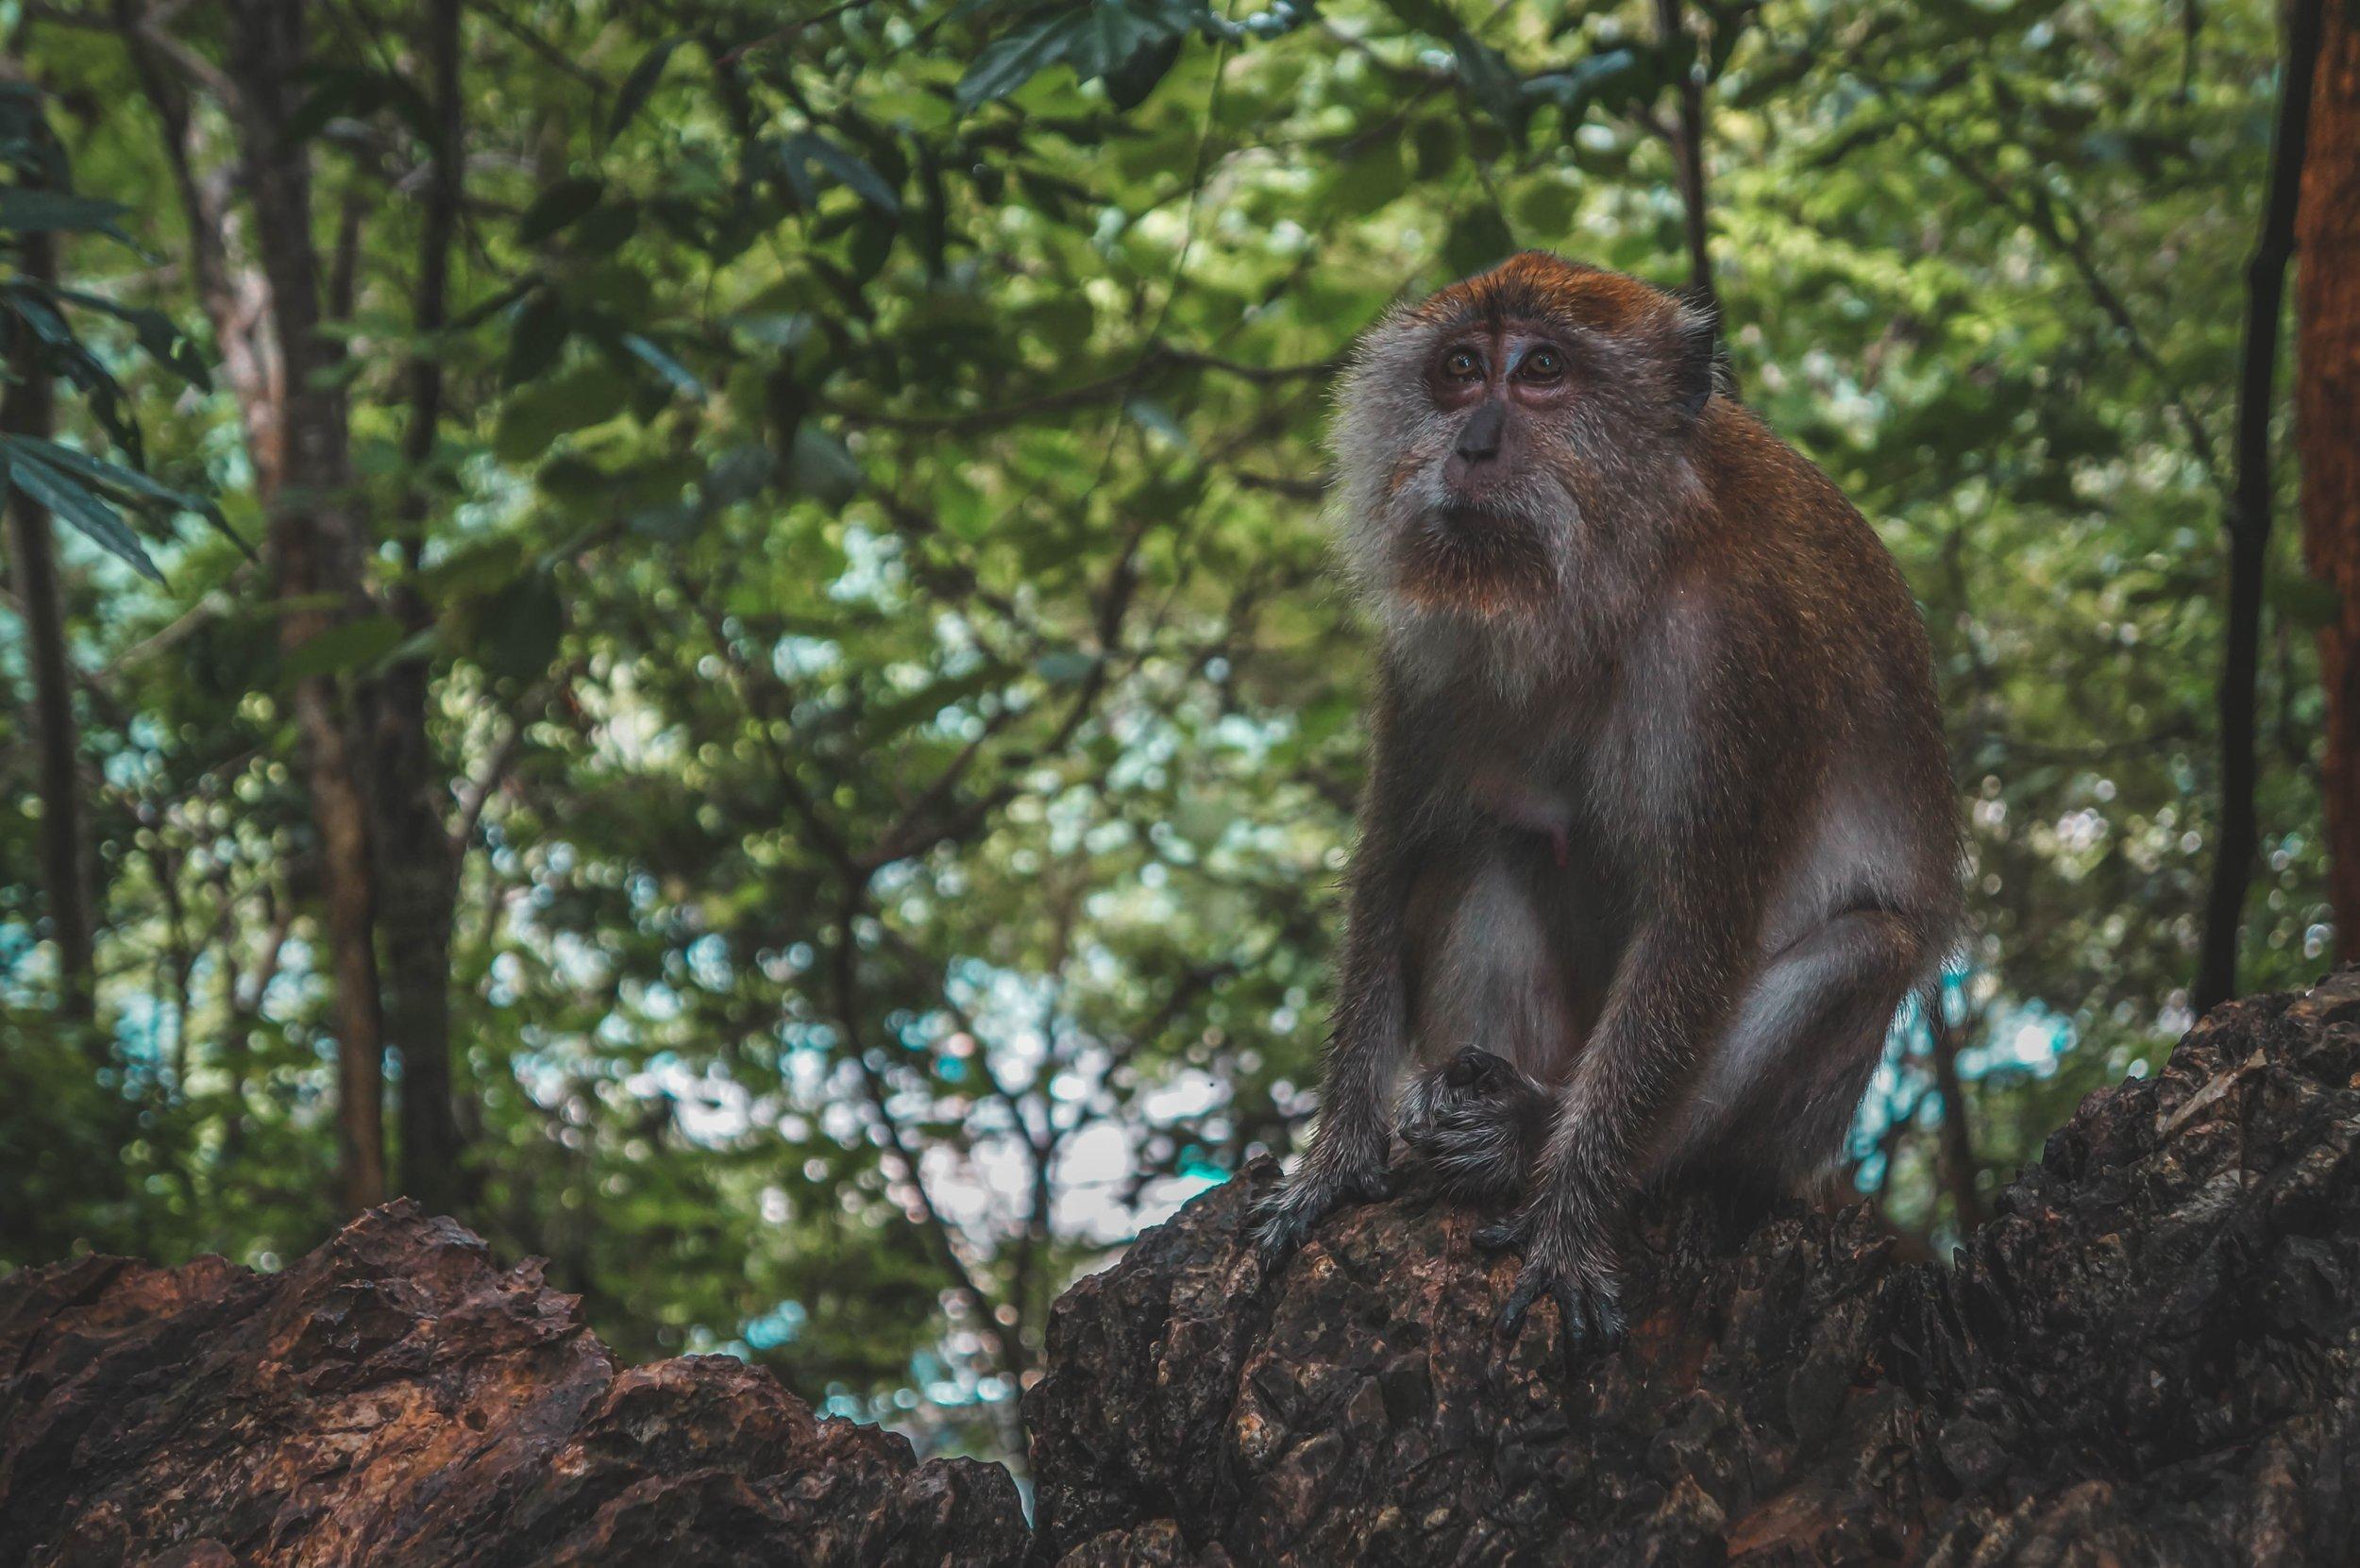 Monkey in Malaysian rainforest